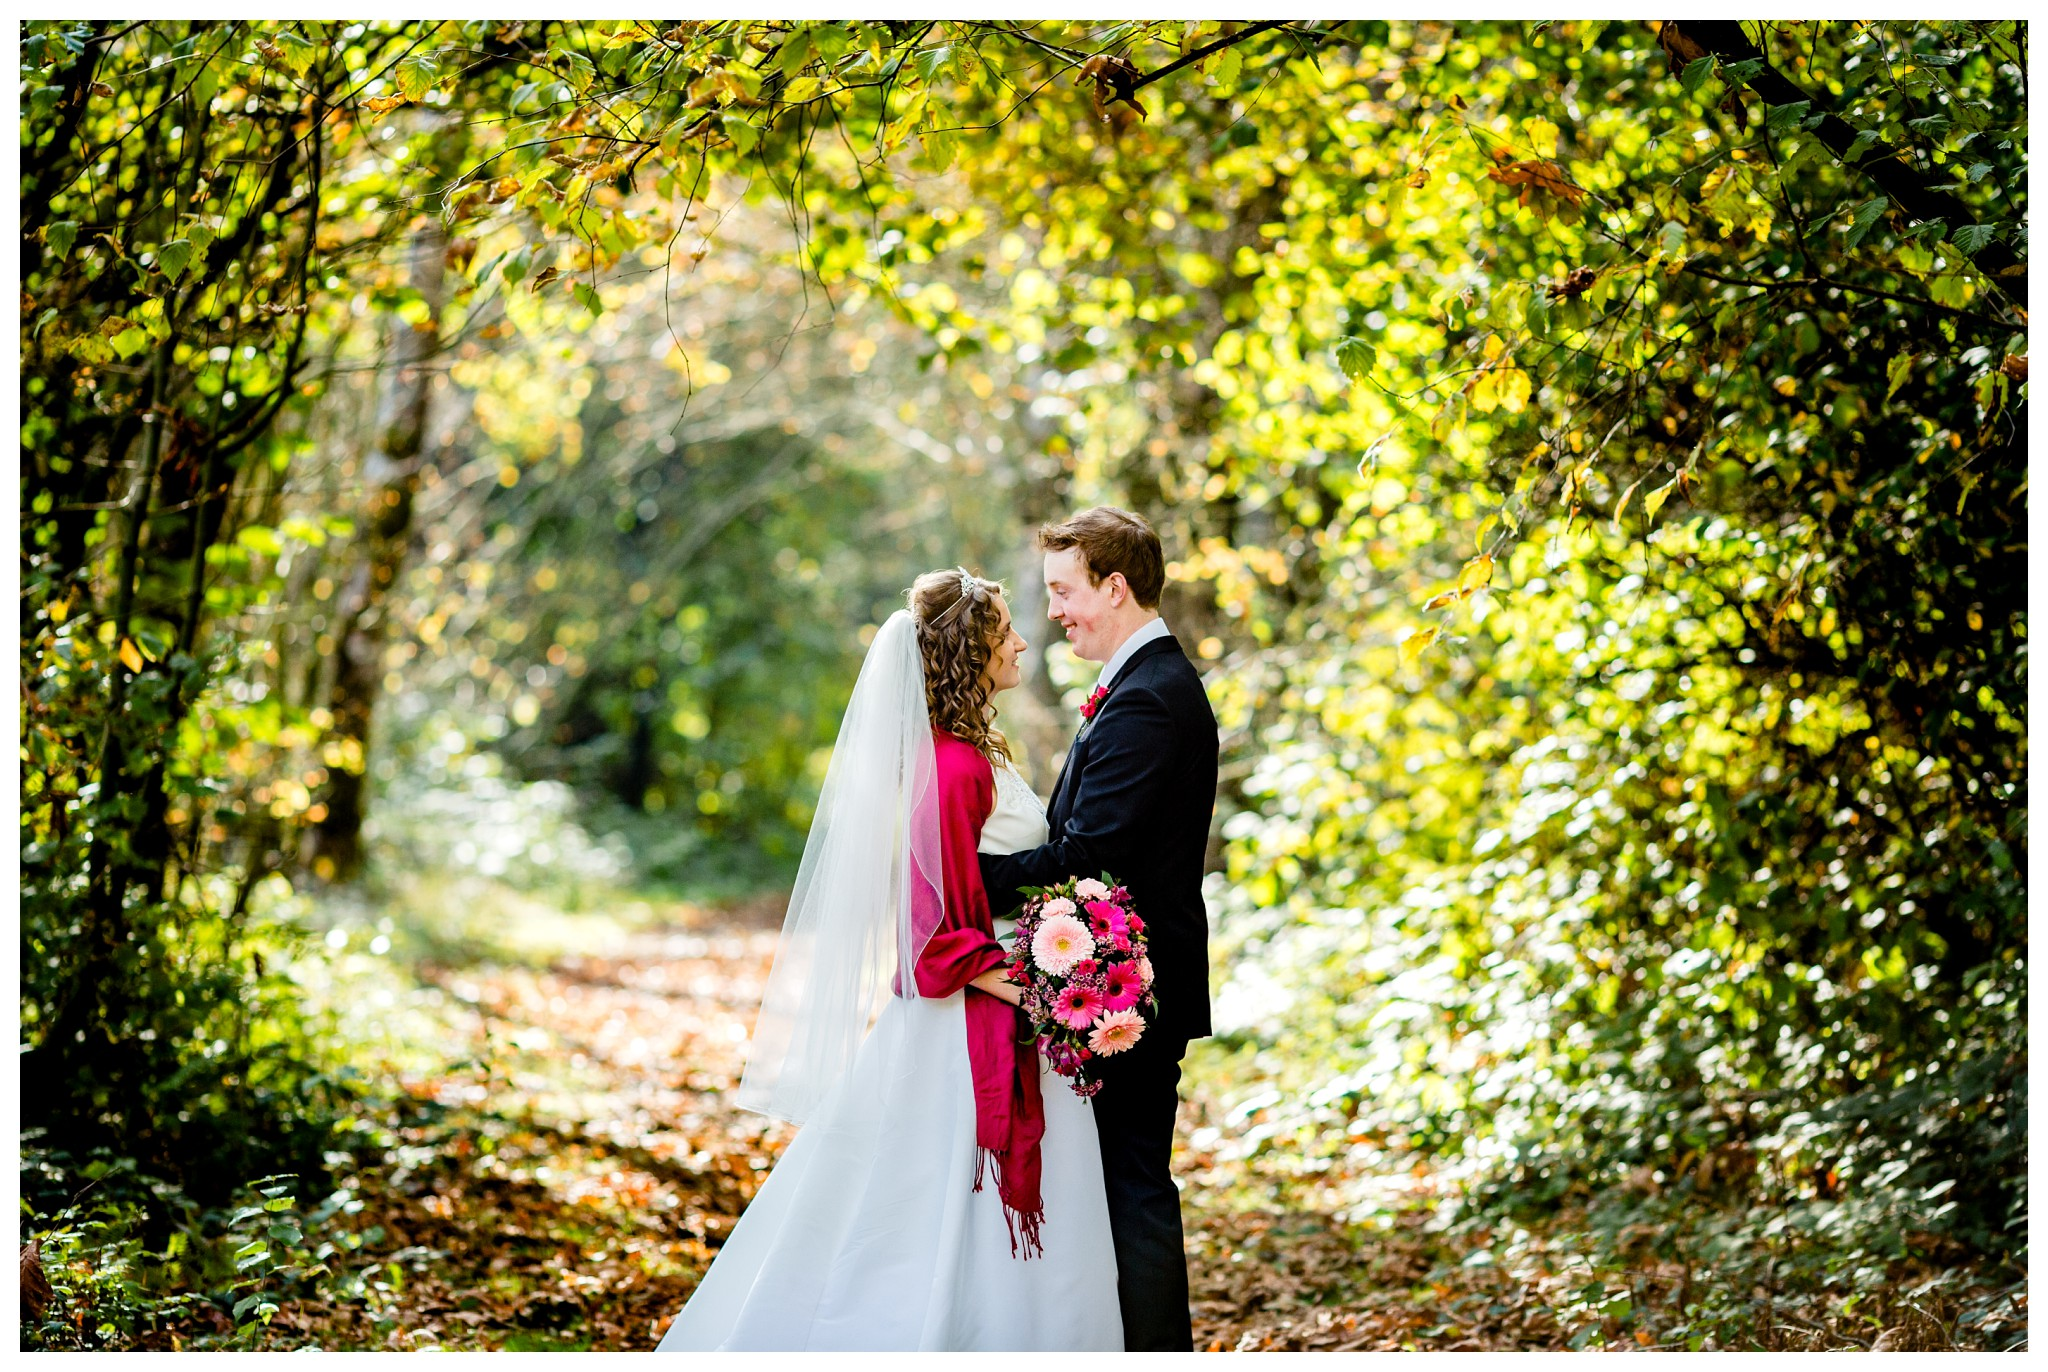 Aldergrove Park Christian Church Wedding Photography Pink Flowers Blue Bridesmaid Dress Fall_0087.jpg